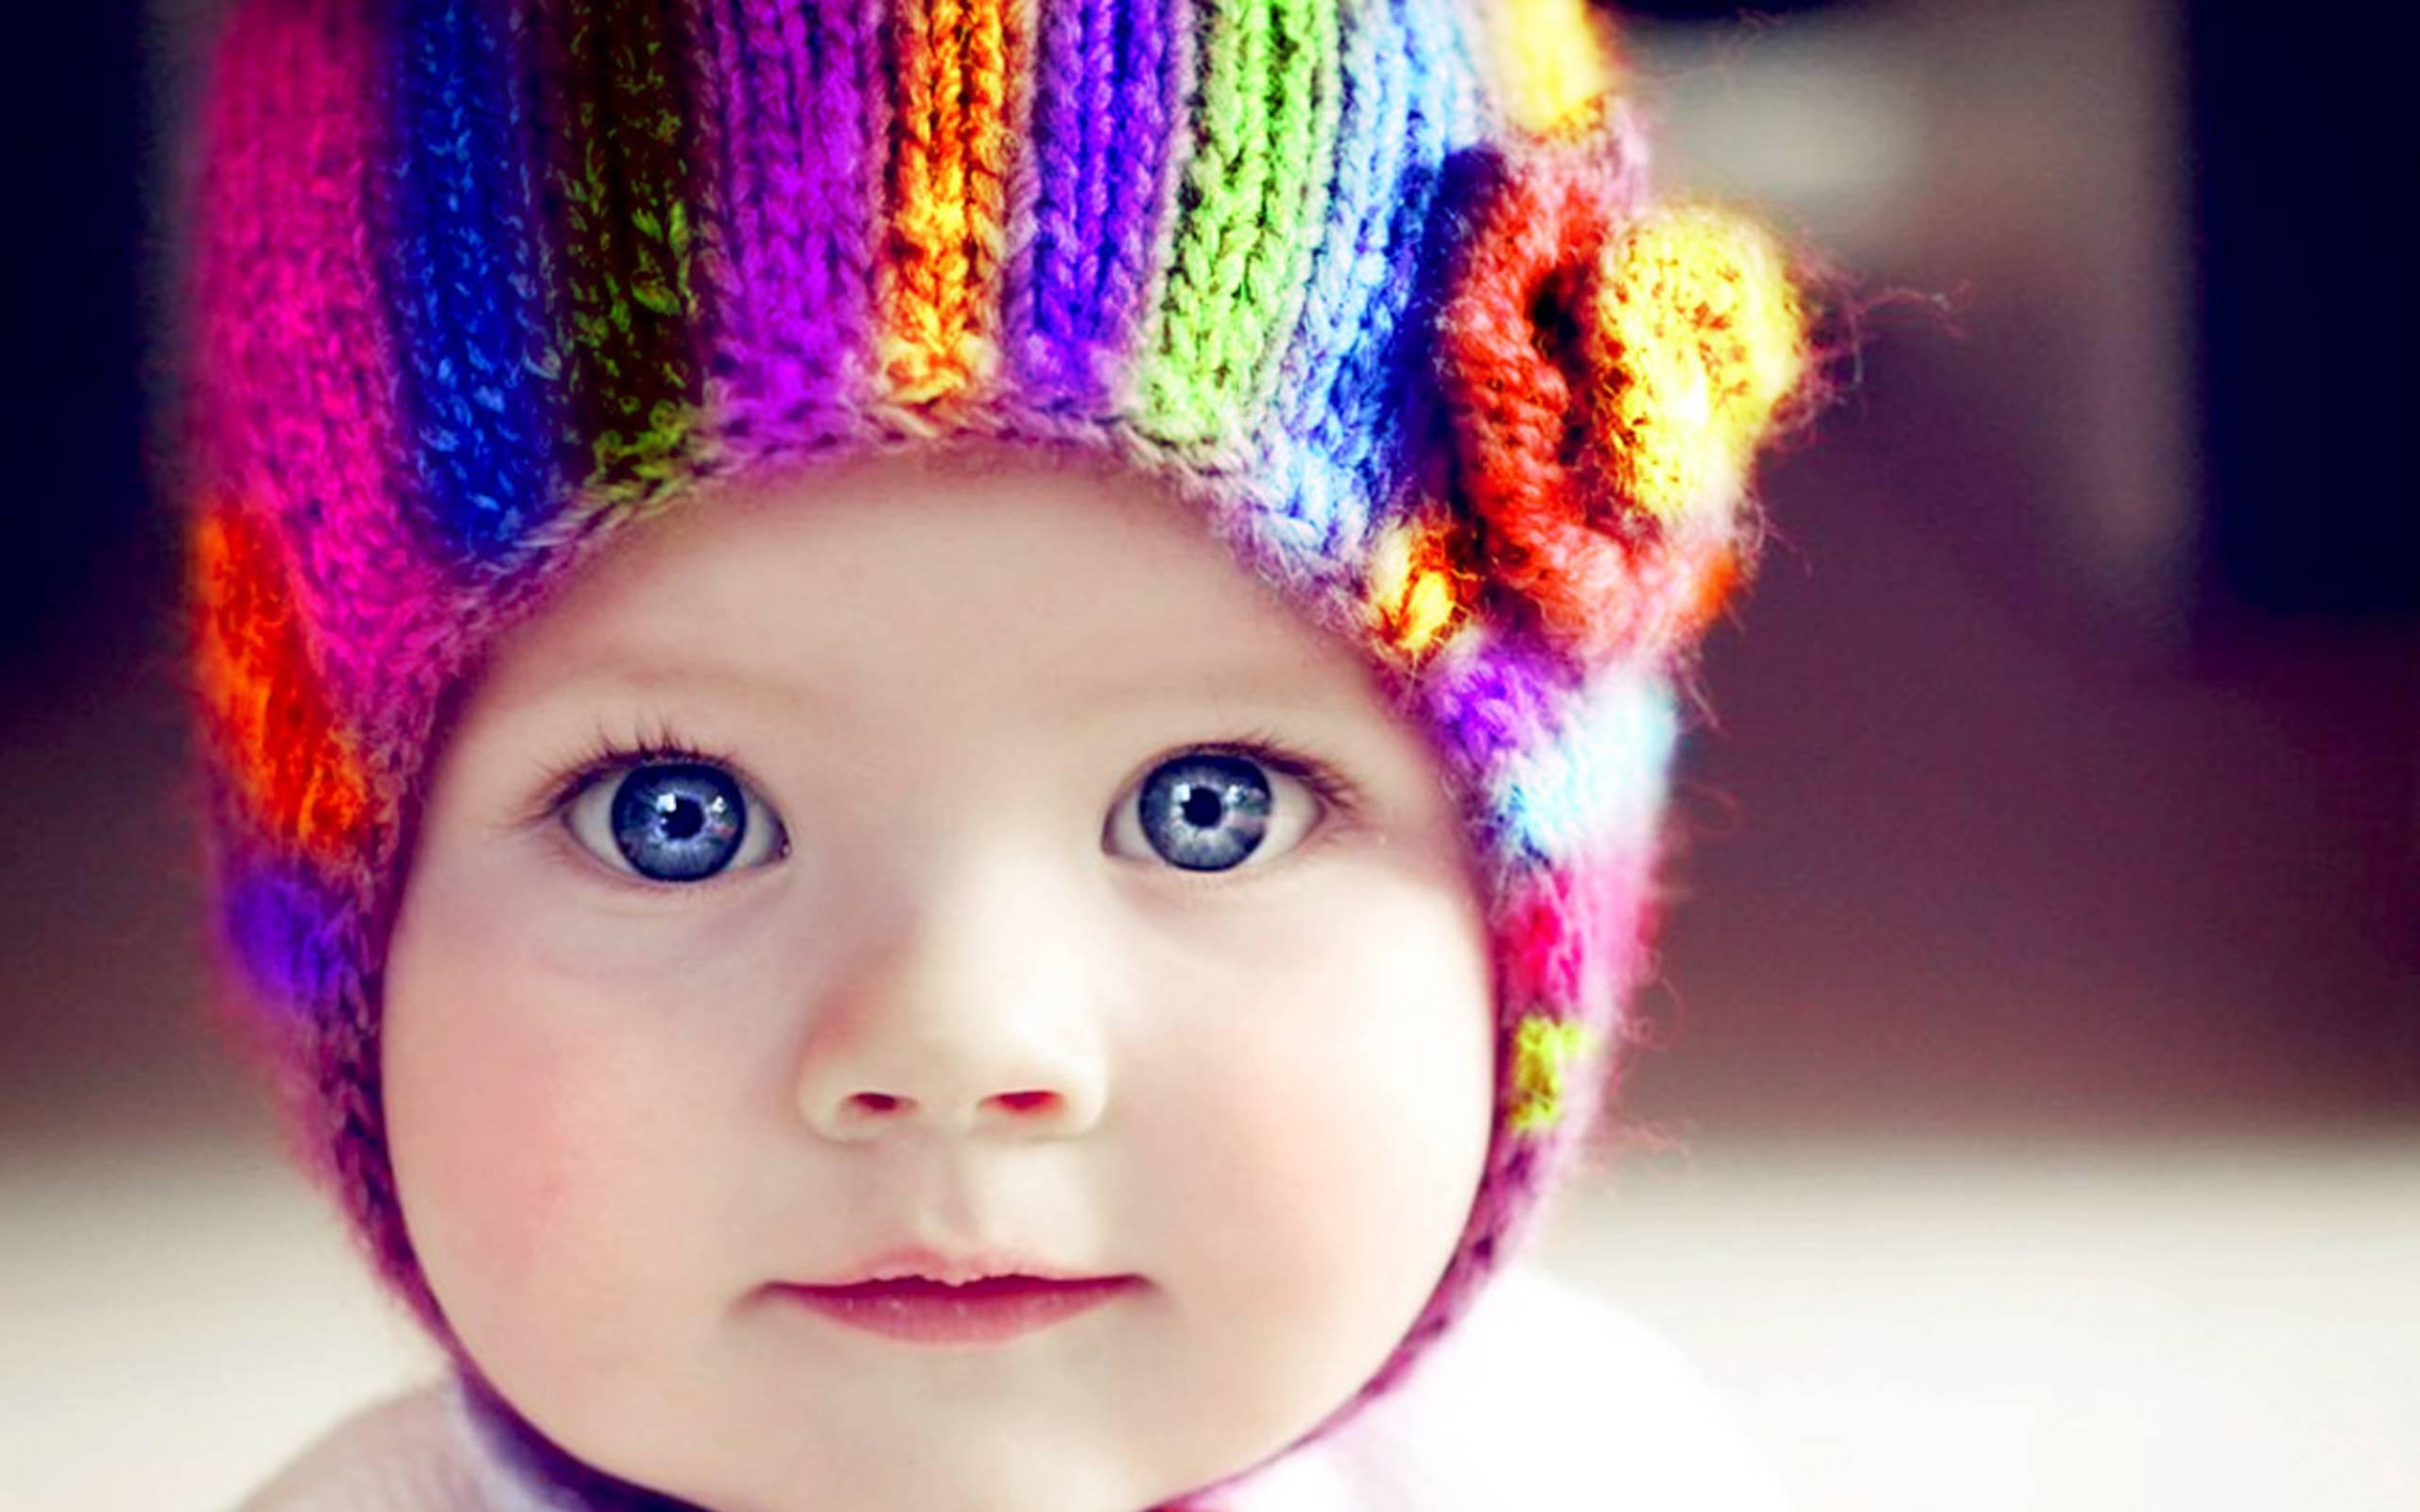 download Cute Babies Wallpapers Cute Babies Wallpapers Color 2560x1600